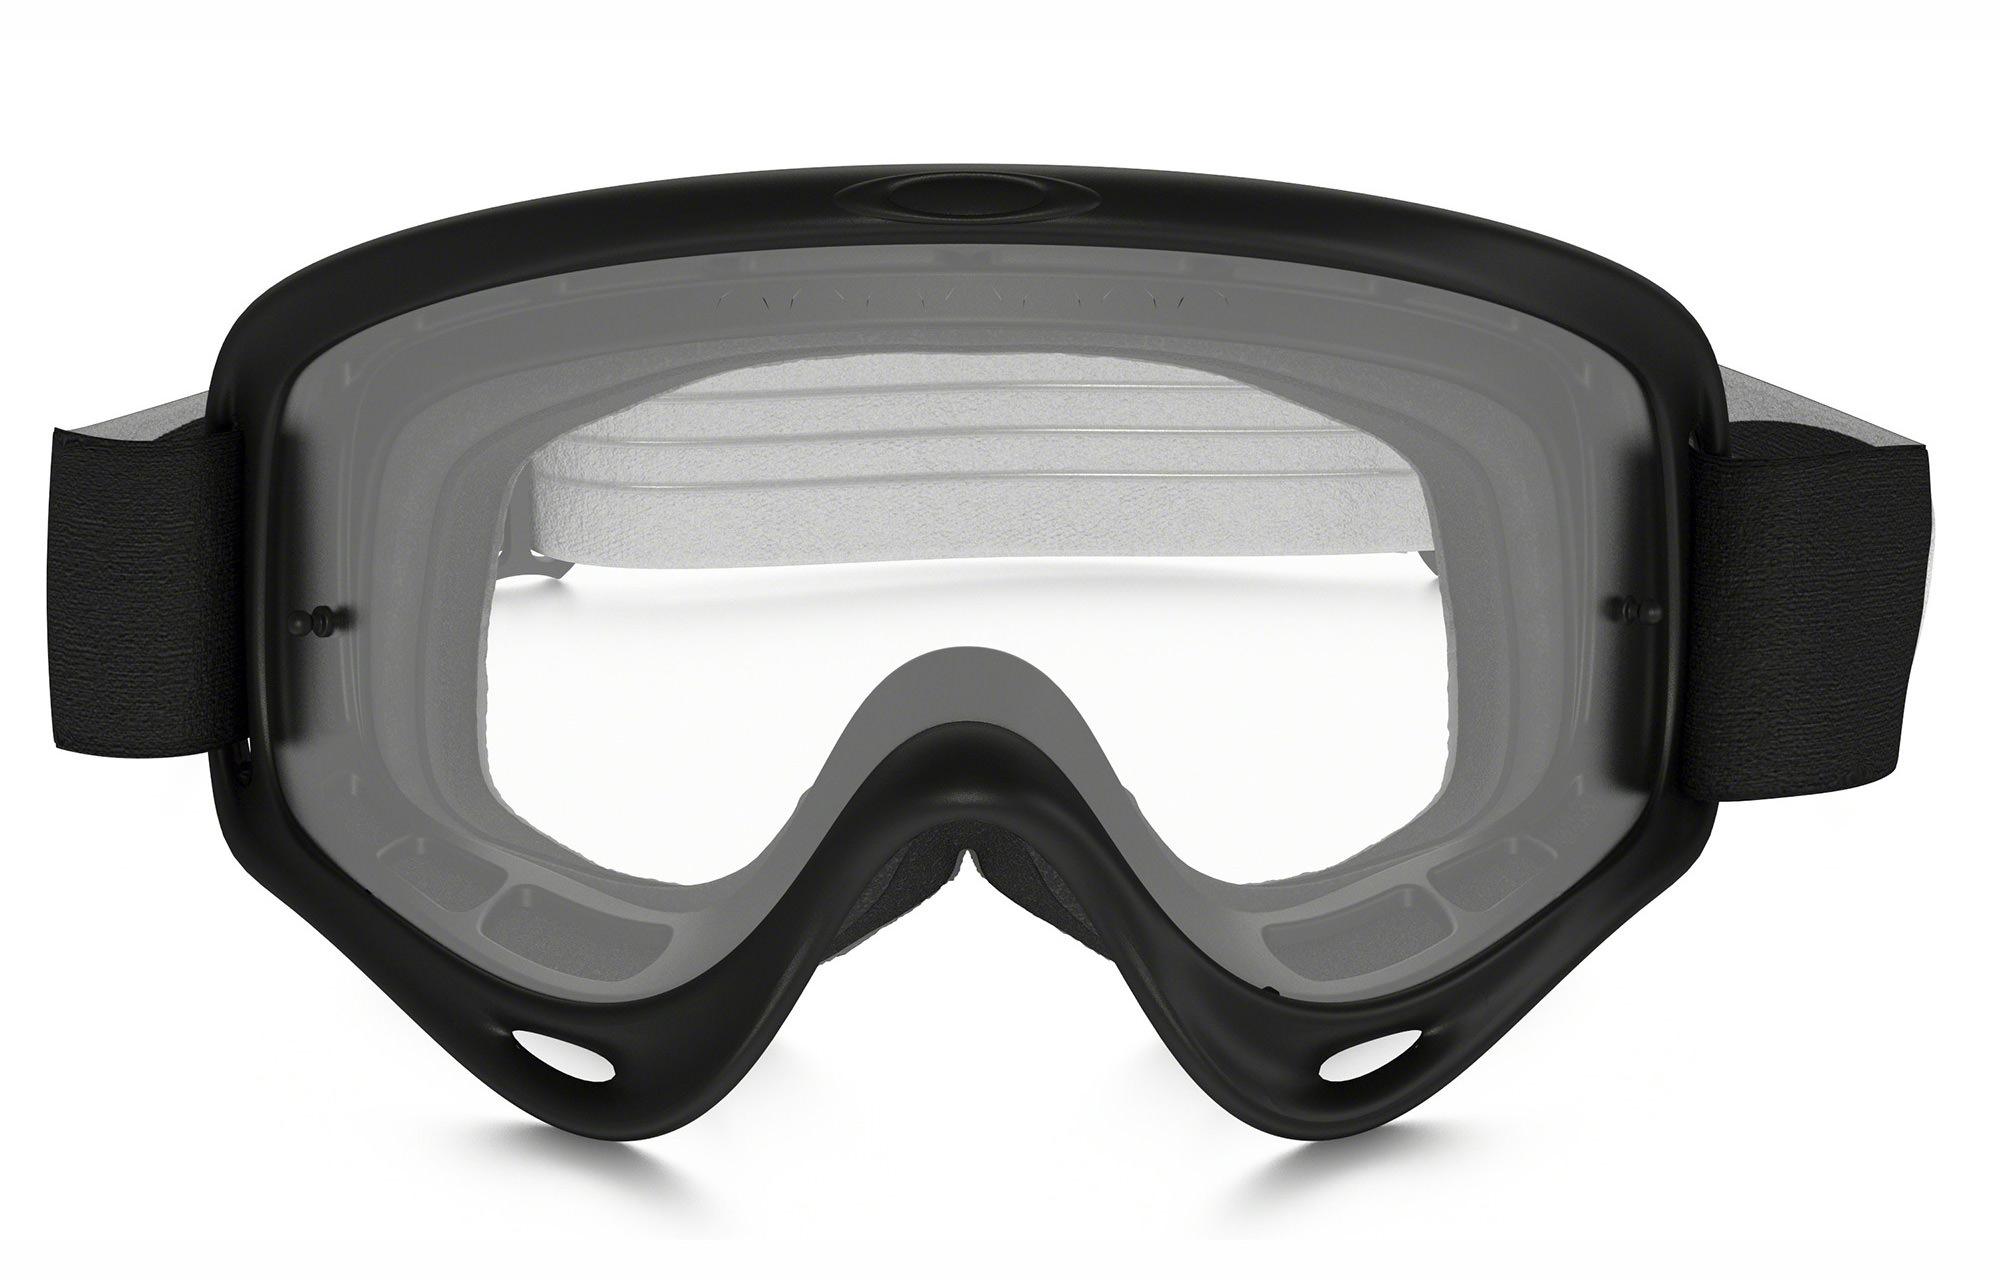 b2c2b4f9261 Oakley O Frame Mx Goggles With Clear Lens « Heritage Malta